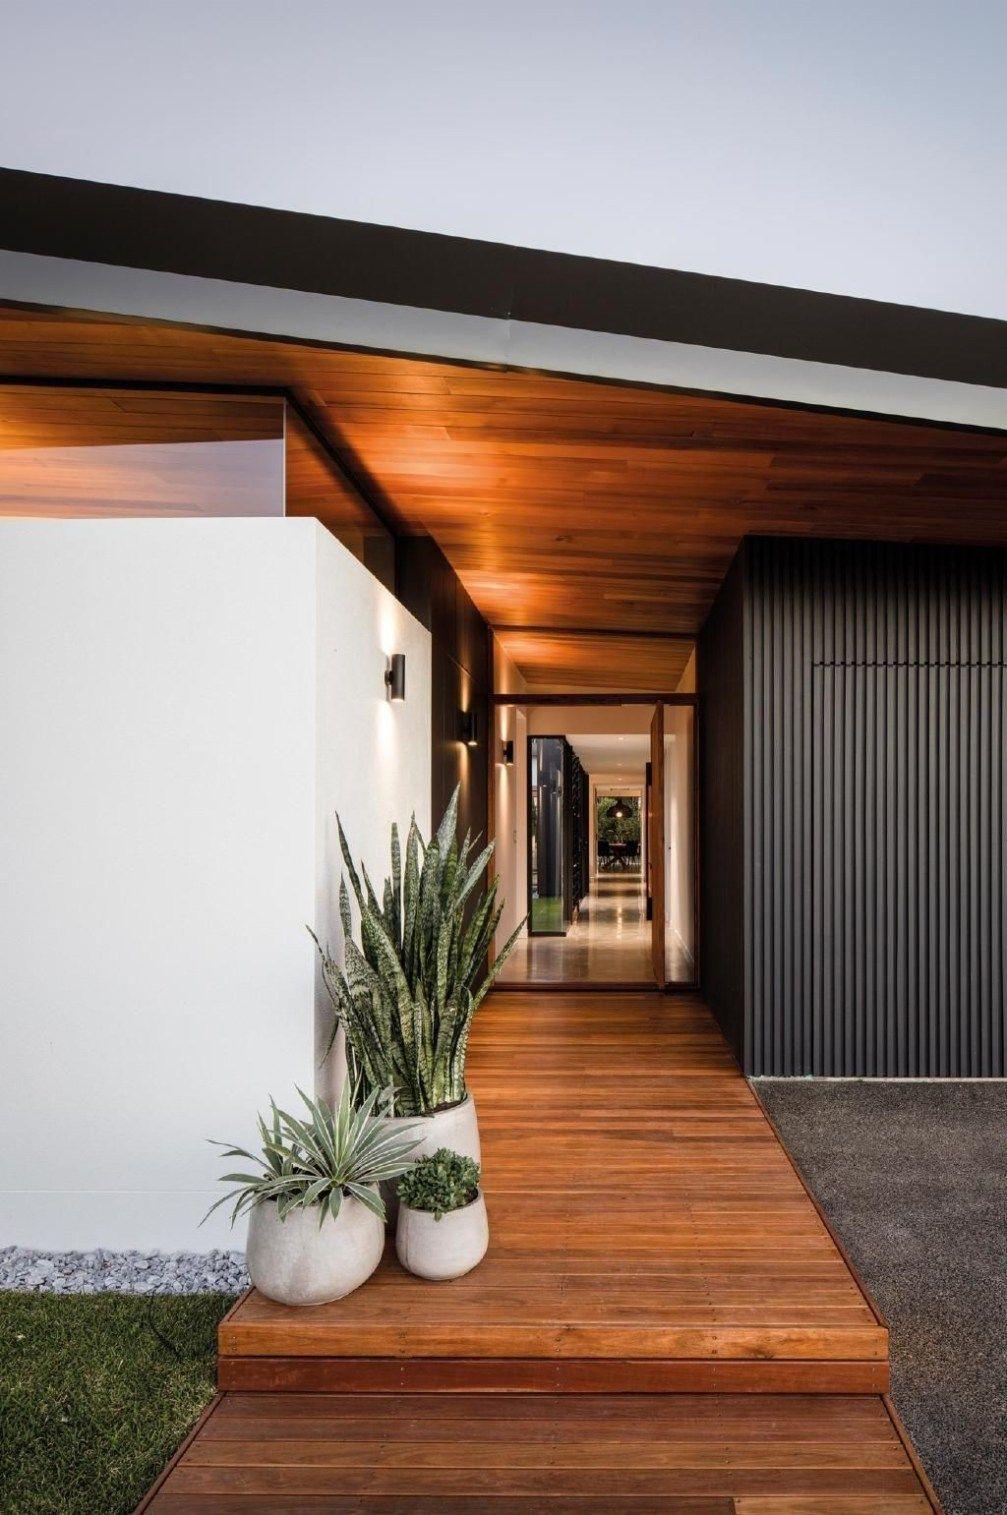 38 amazing mid century modern house ideas hoomdesign